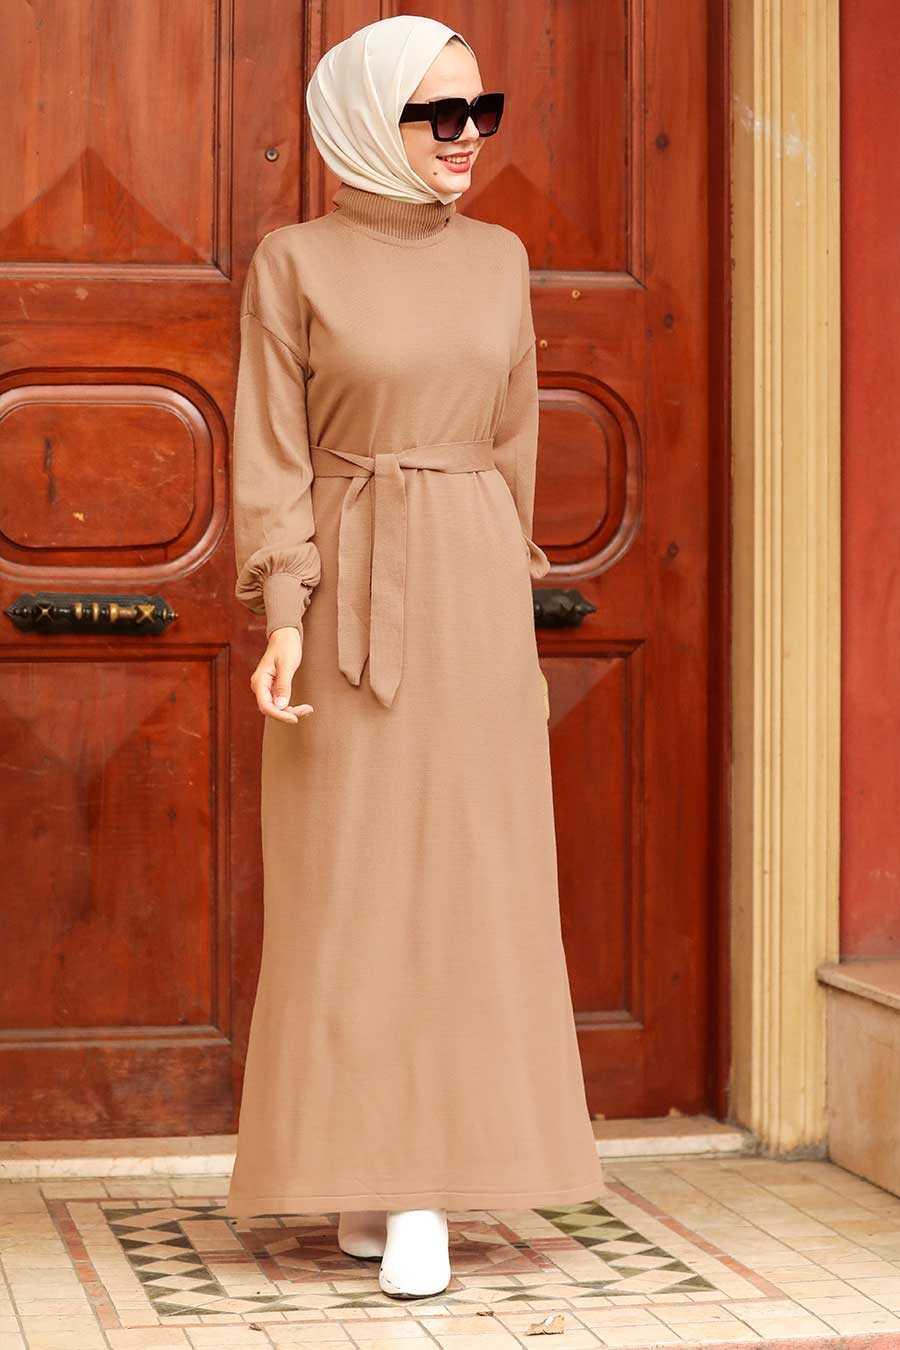 Biscuit Hijab Knitwear Dress 3135BS